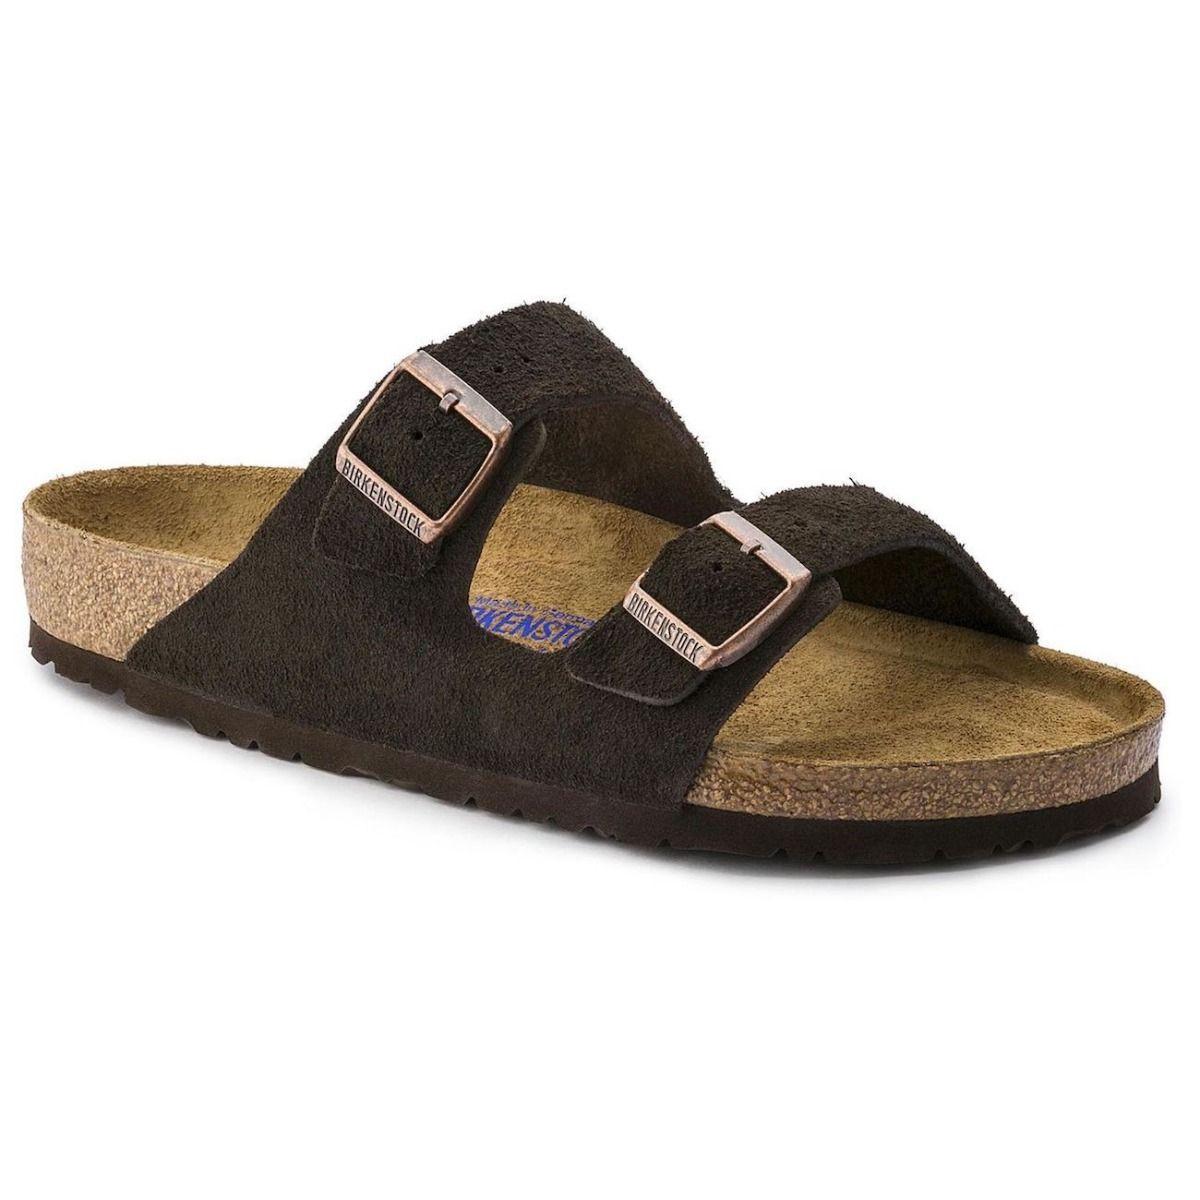 birkenstock arizona soft footbed suede leather sandals